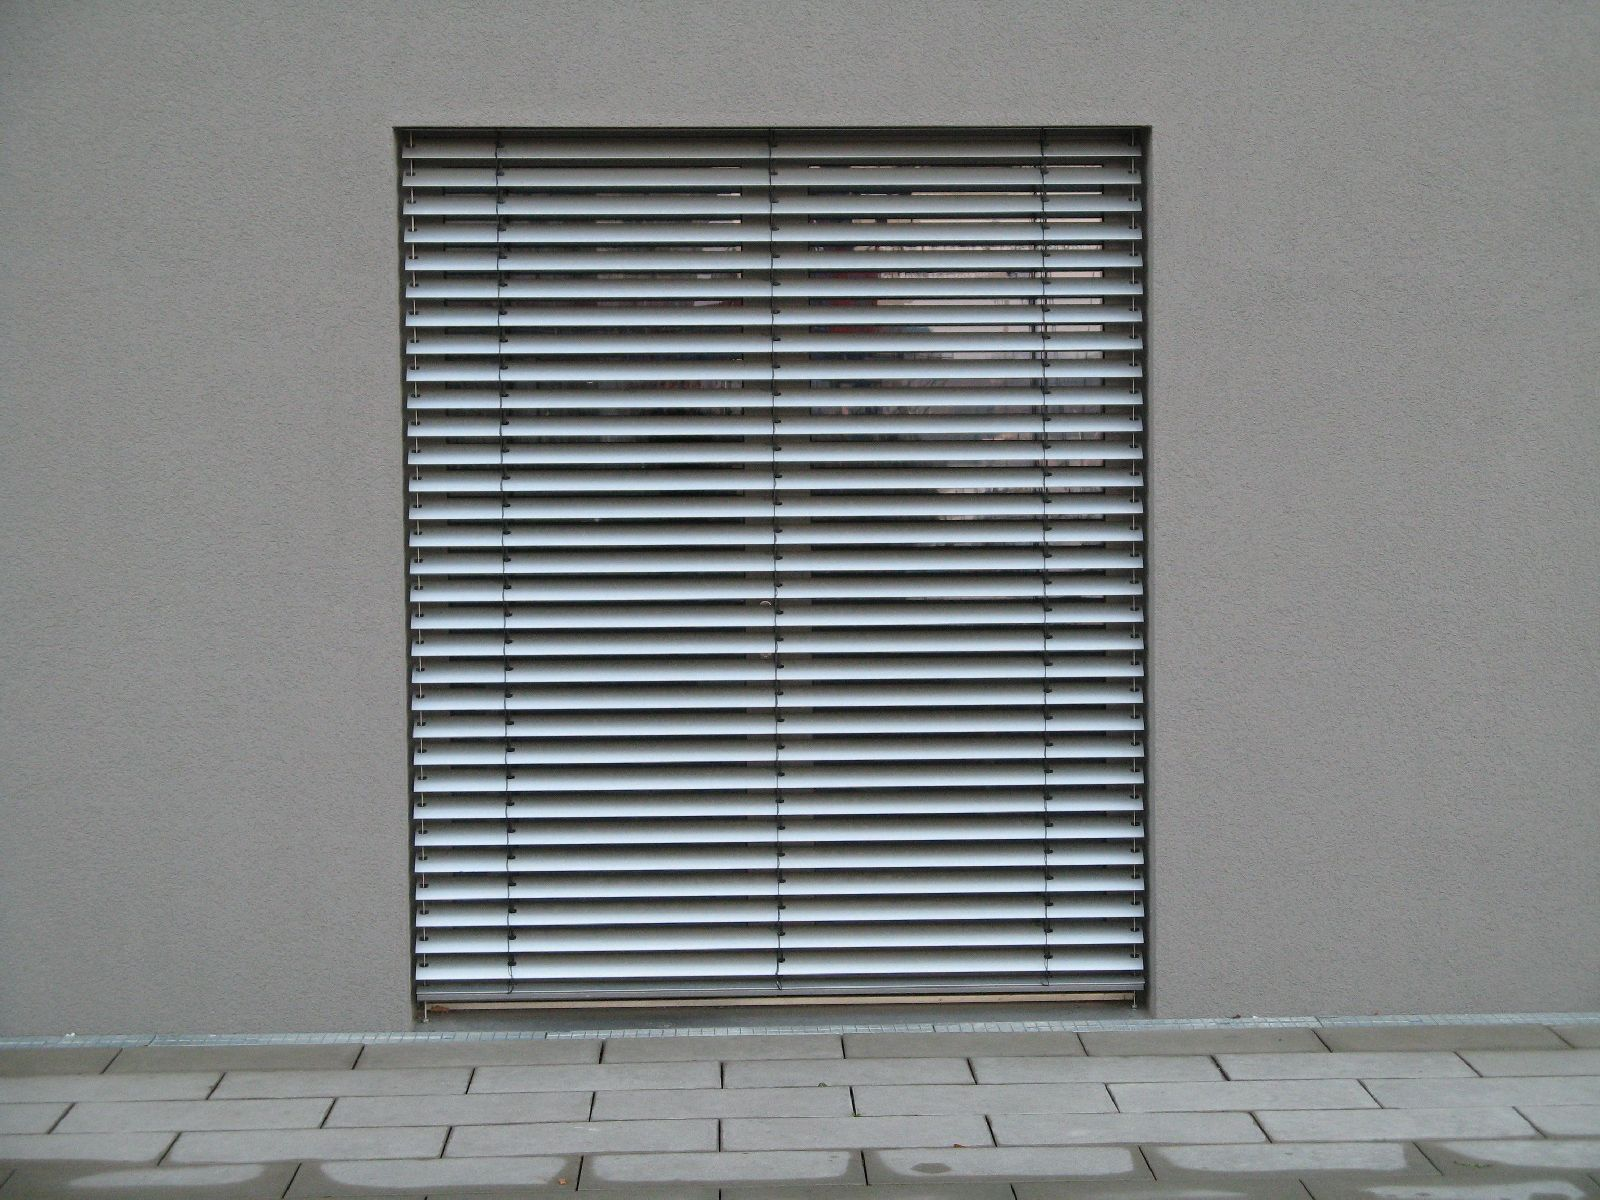 Building_Texture_B_1367